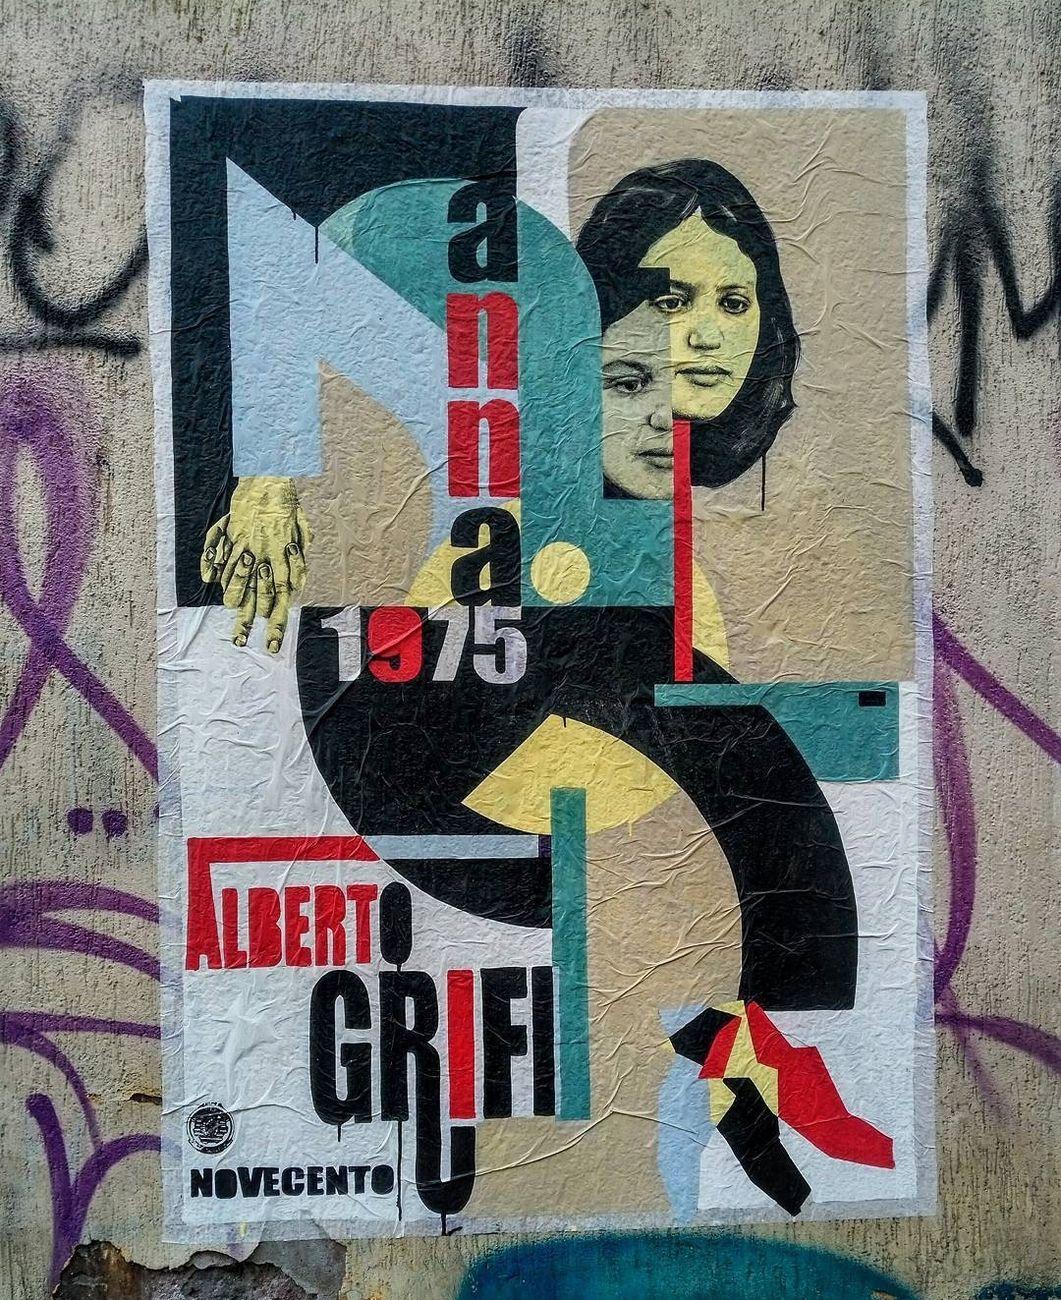 Leonardo Crudi, Anna di Alberto Grifi, 2017, manifesto